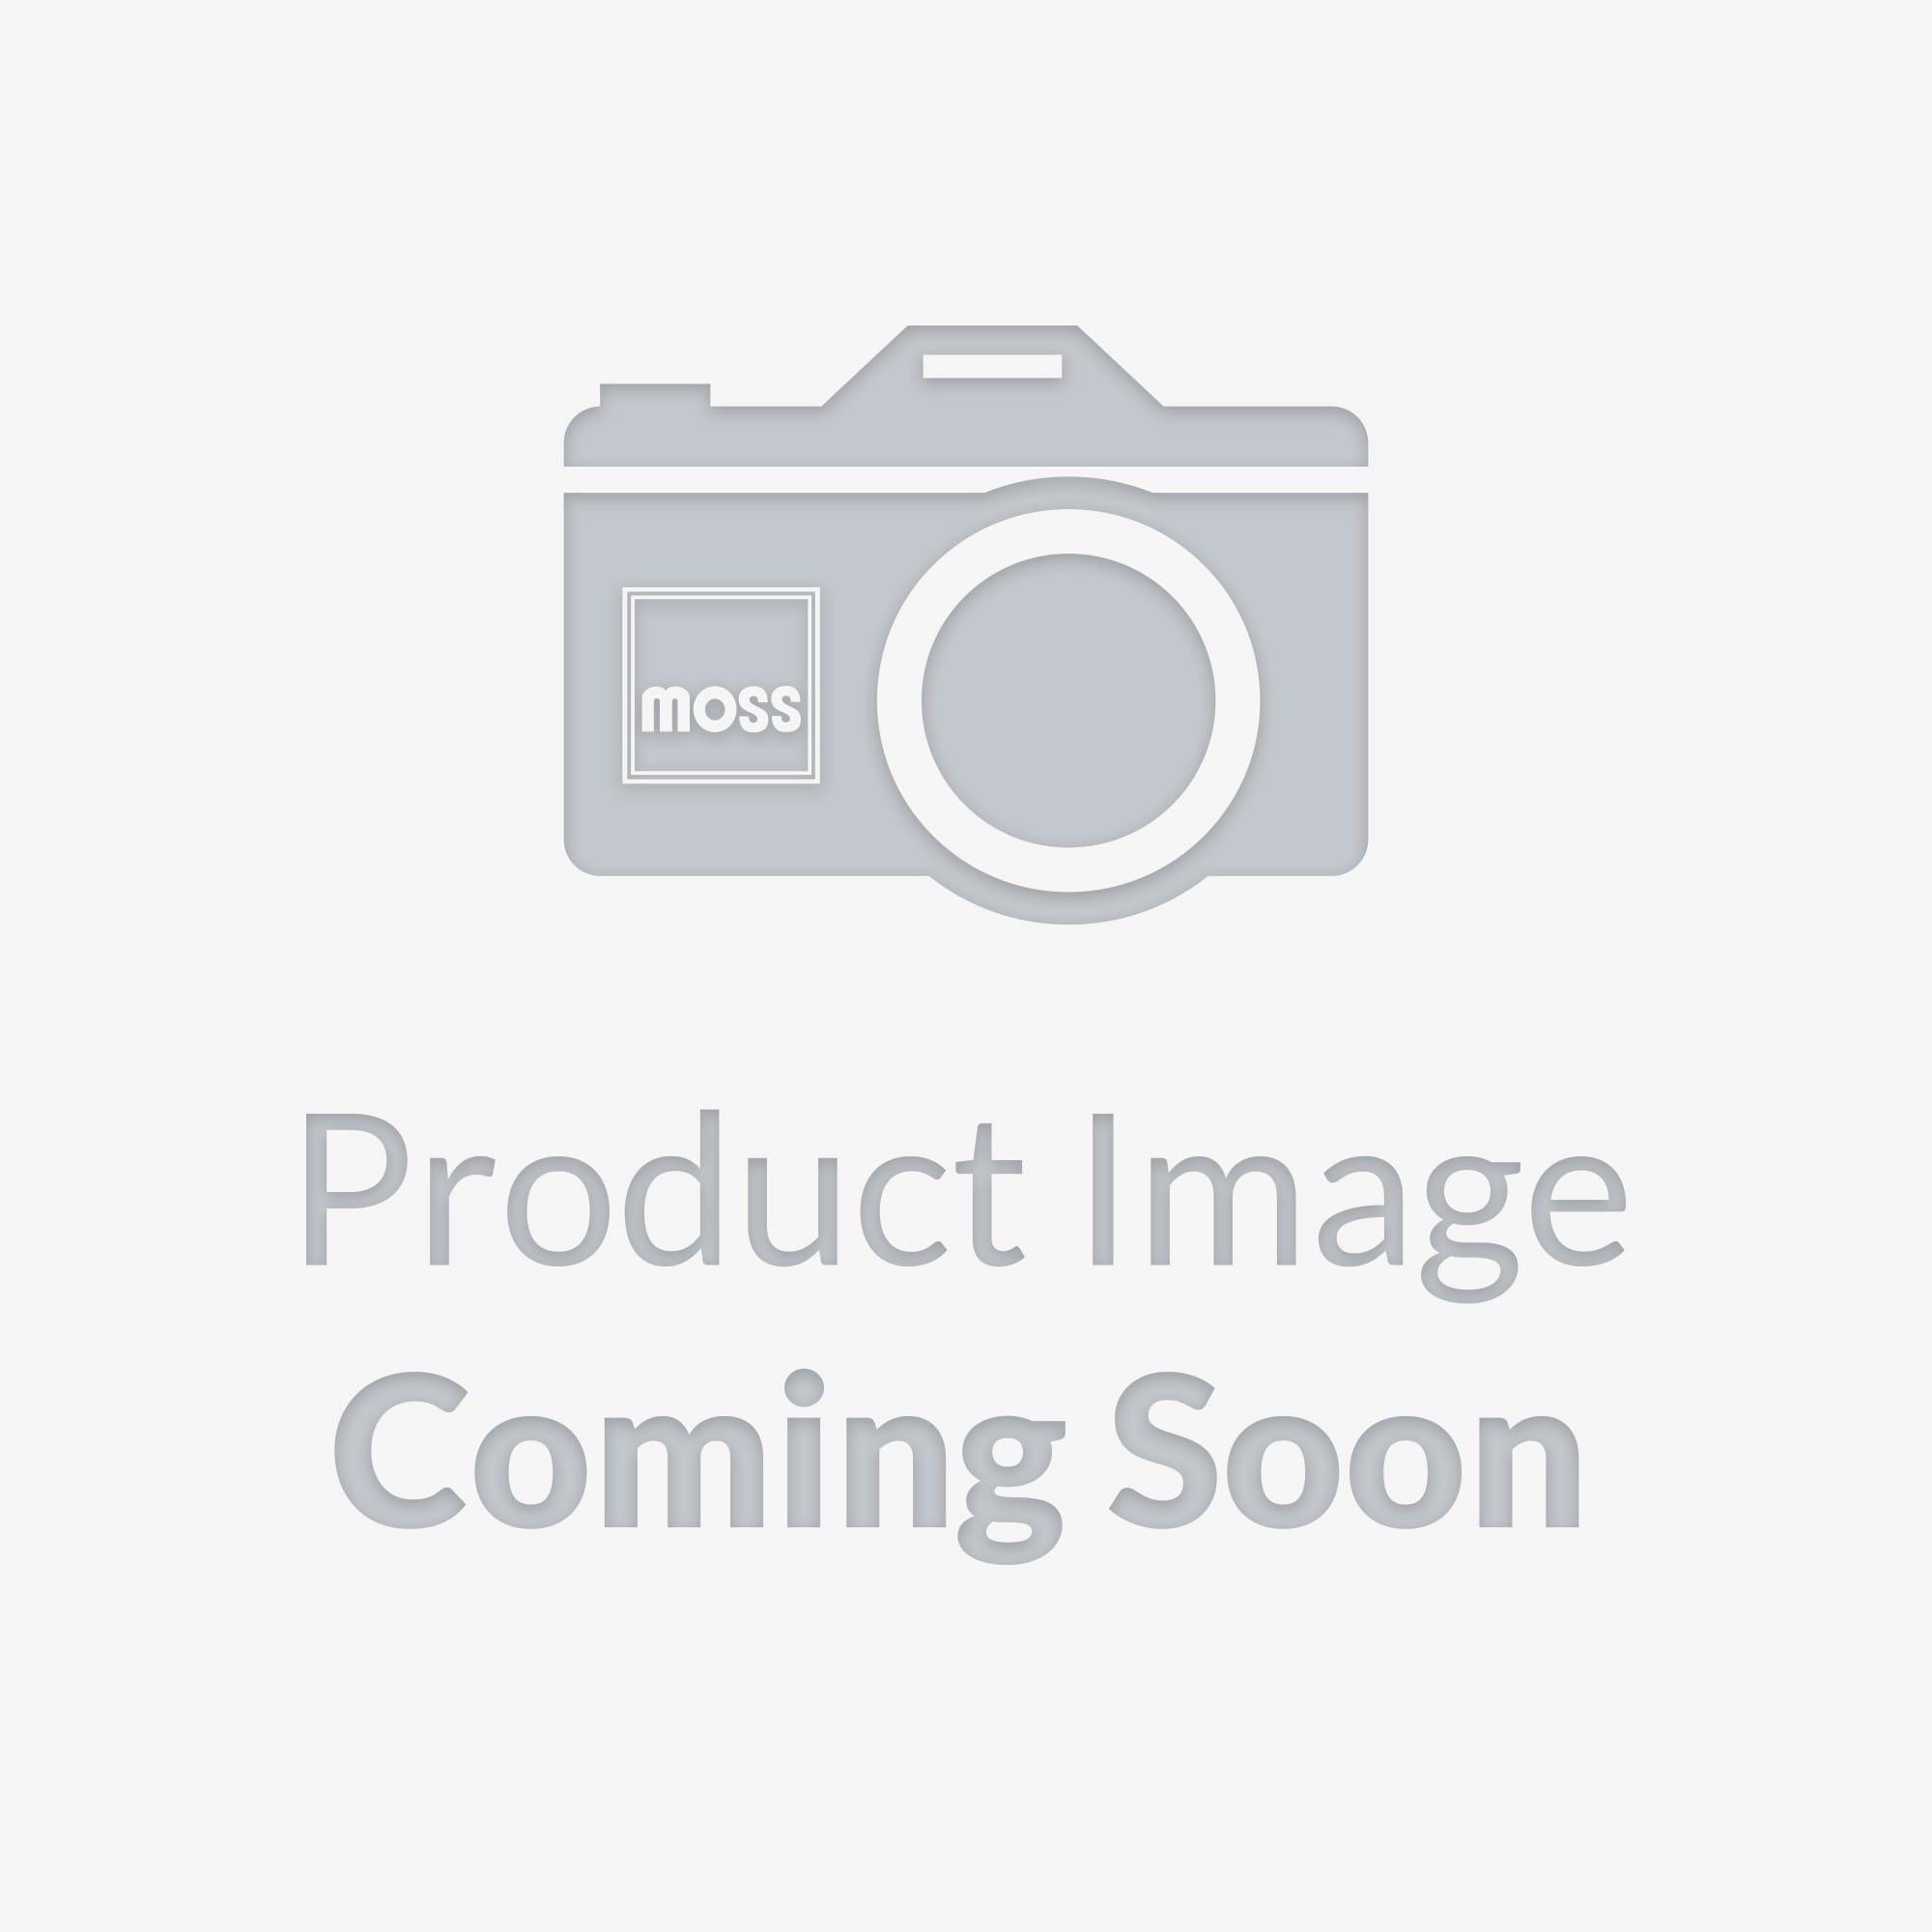 moss motors logos moss motors rh mossmotors com Austin Healey 3000 Austin Healey 3000